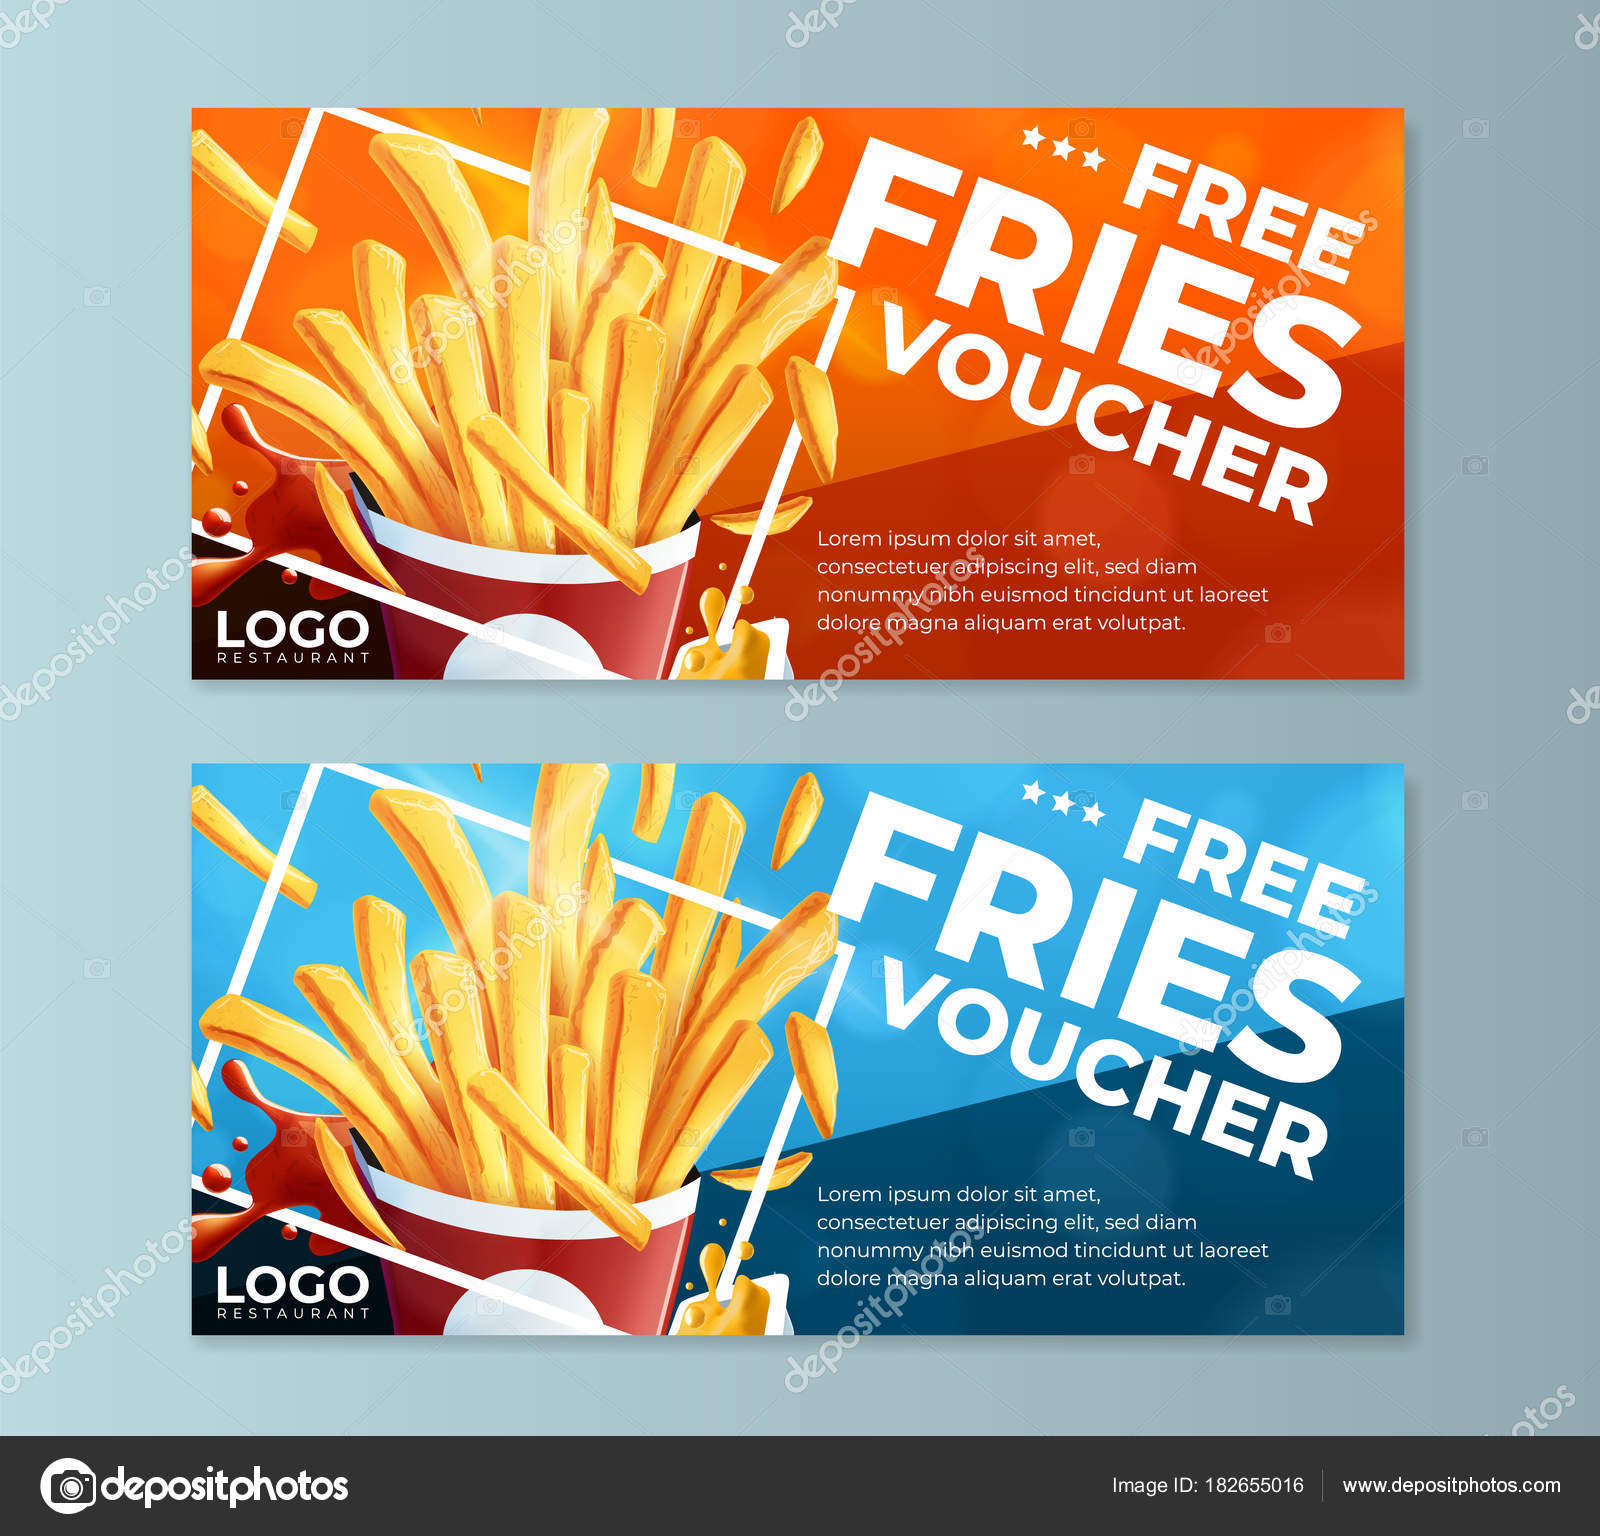 Fast Food Fries Voucher Templates U2014 Stock Vector © Vmalafeevskiy  Depositphotos 182655016 Stock Illustration Fast  Meal Voucher Template